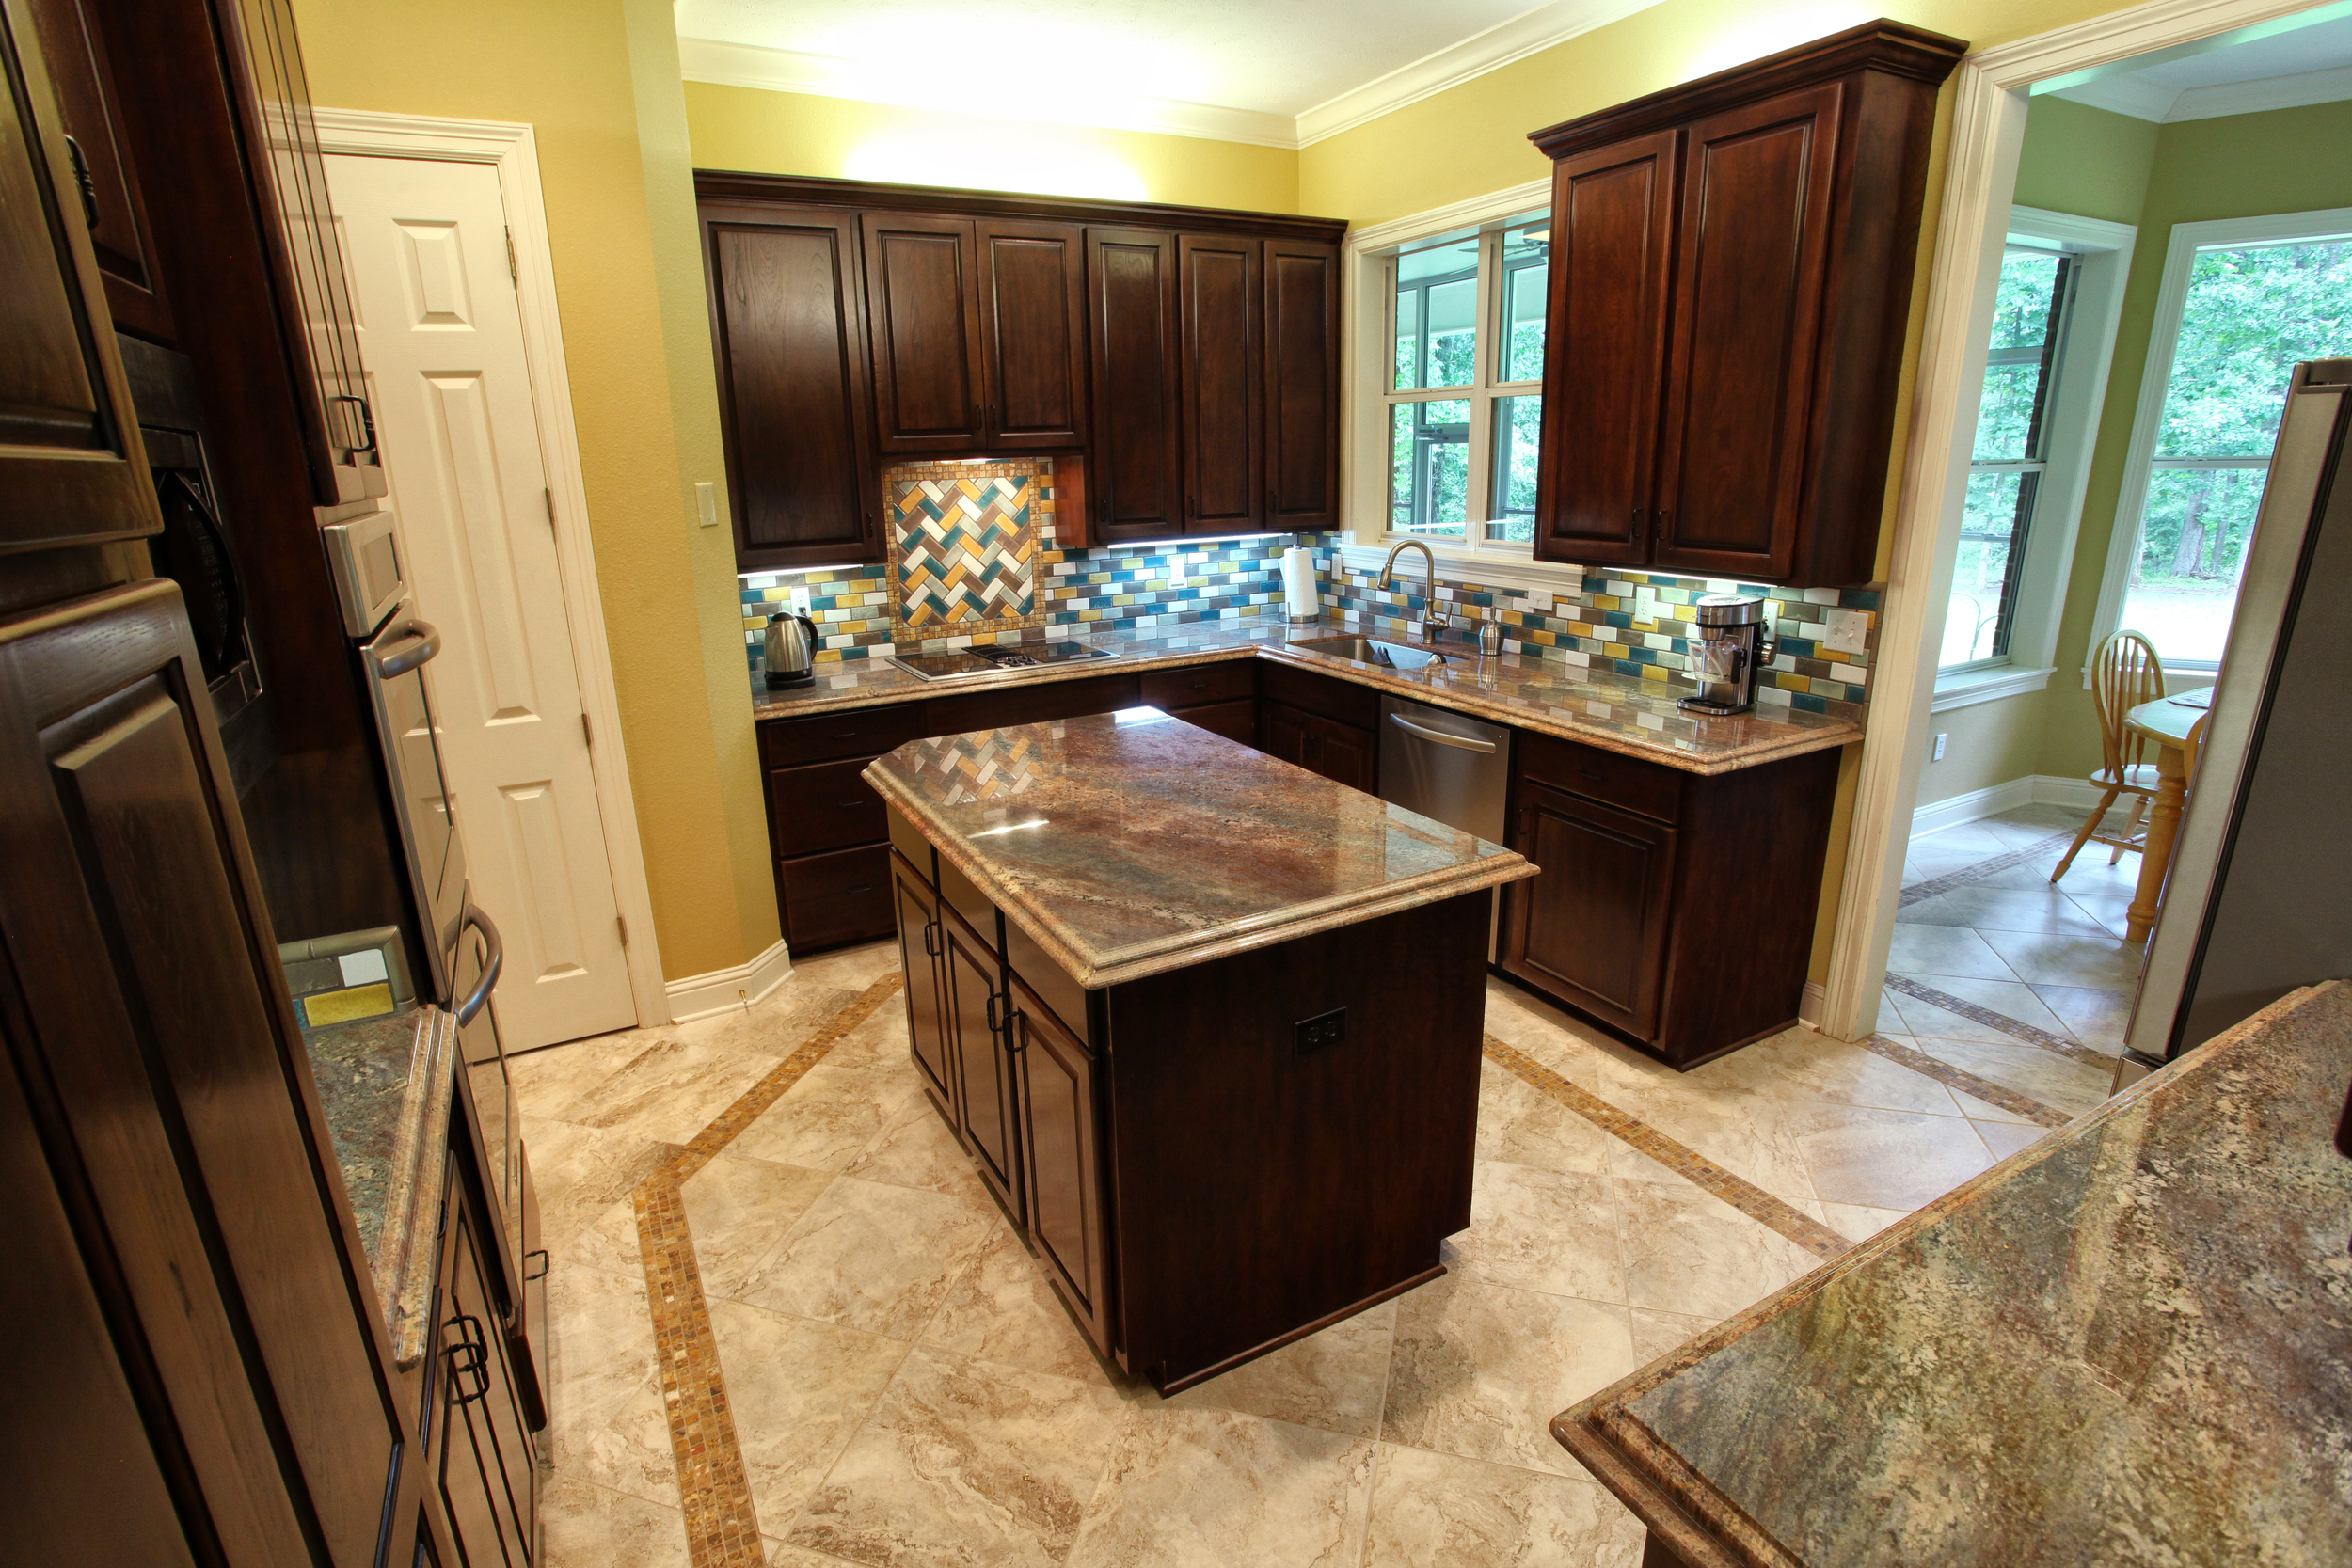 Mexican tile and granite countertops - Texas Interior Design